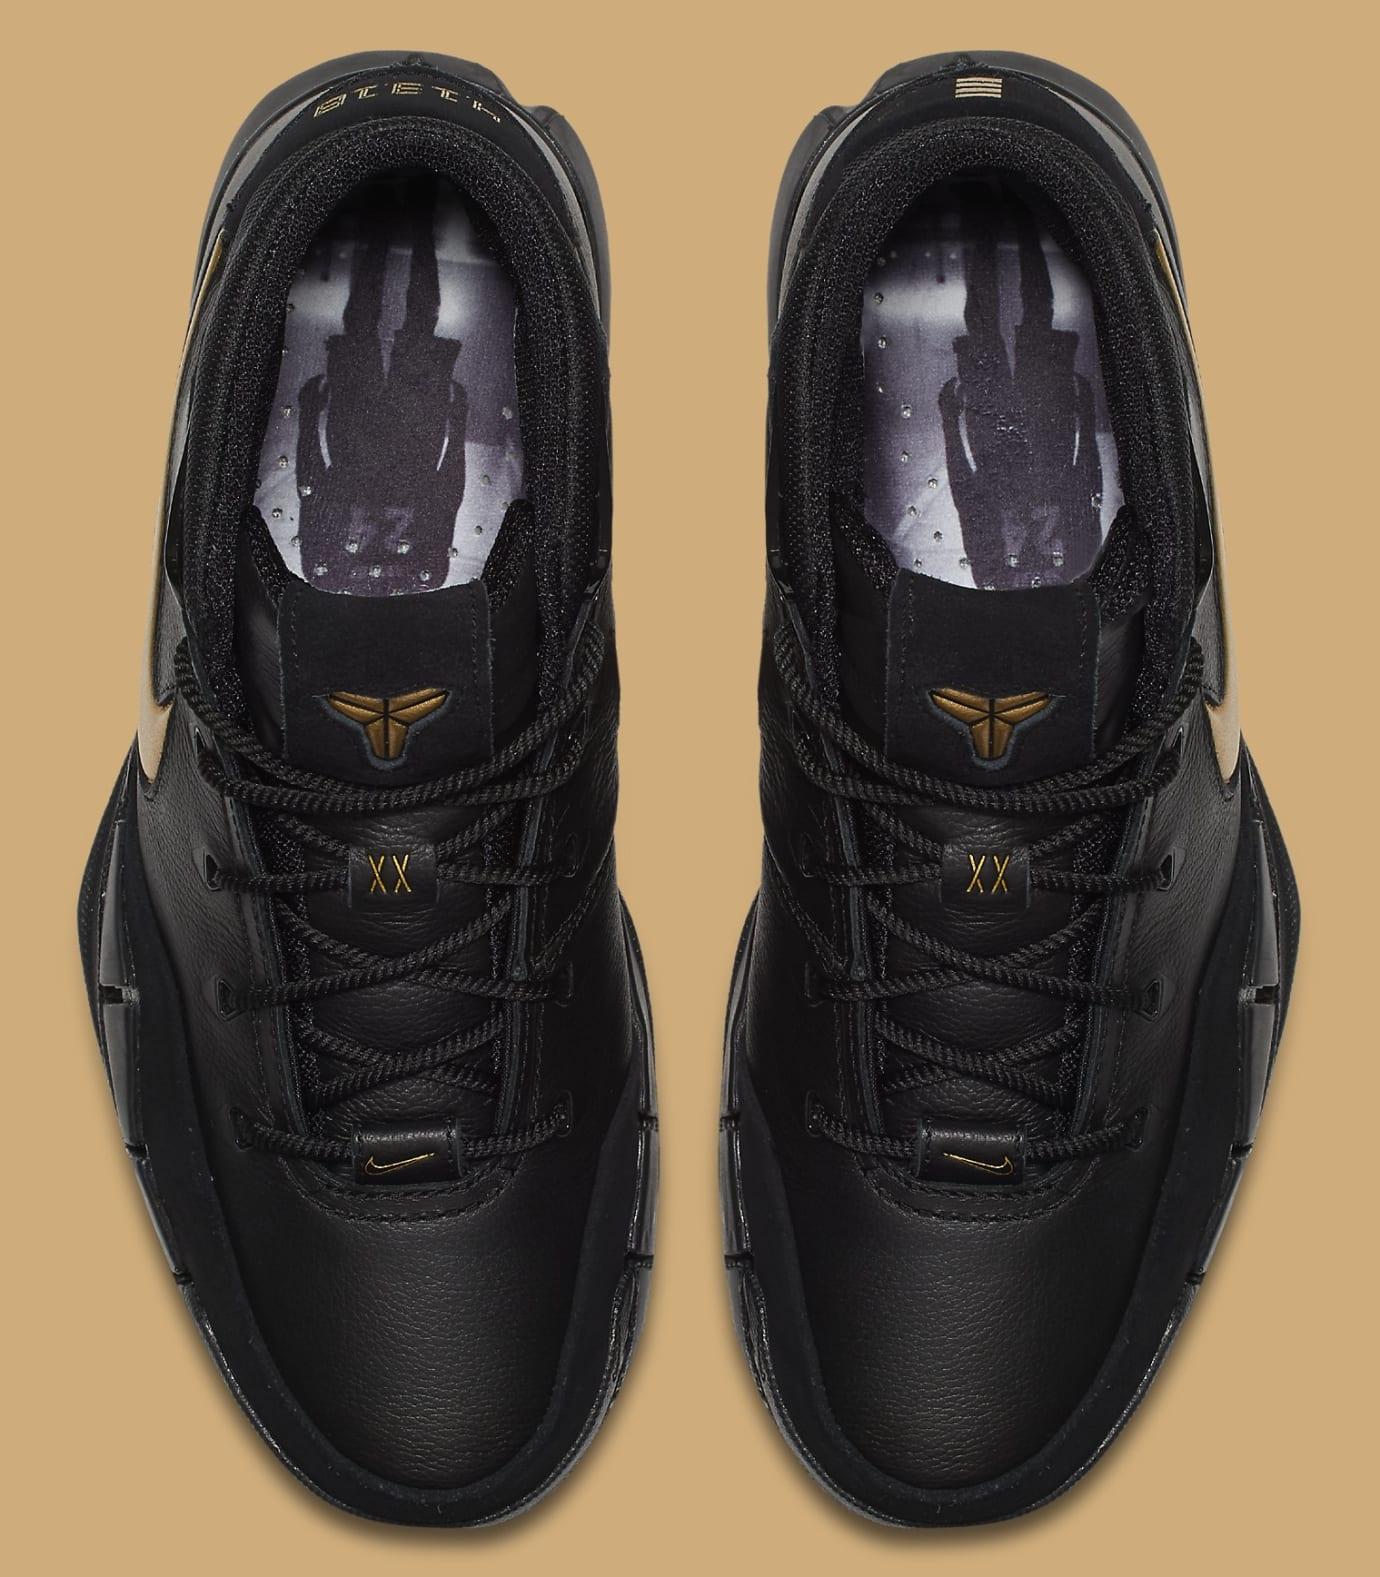 6fd4f6c3b850 Image via Nike Nike Kobe 1 Protro  Black Black White Metallic Gold  AQ2728-